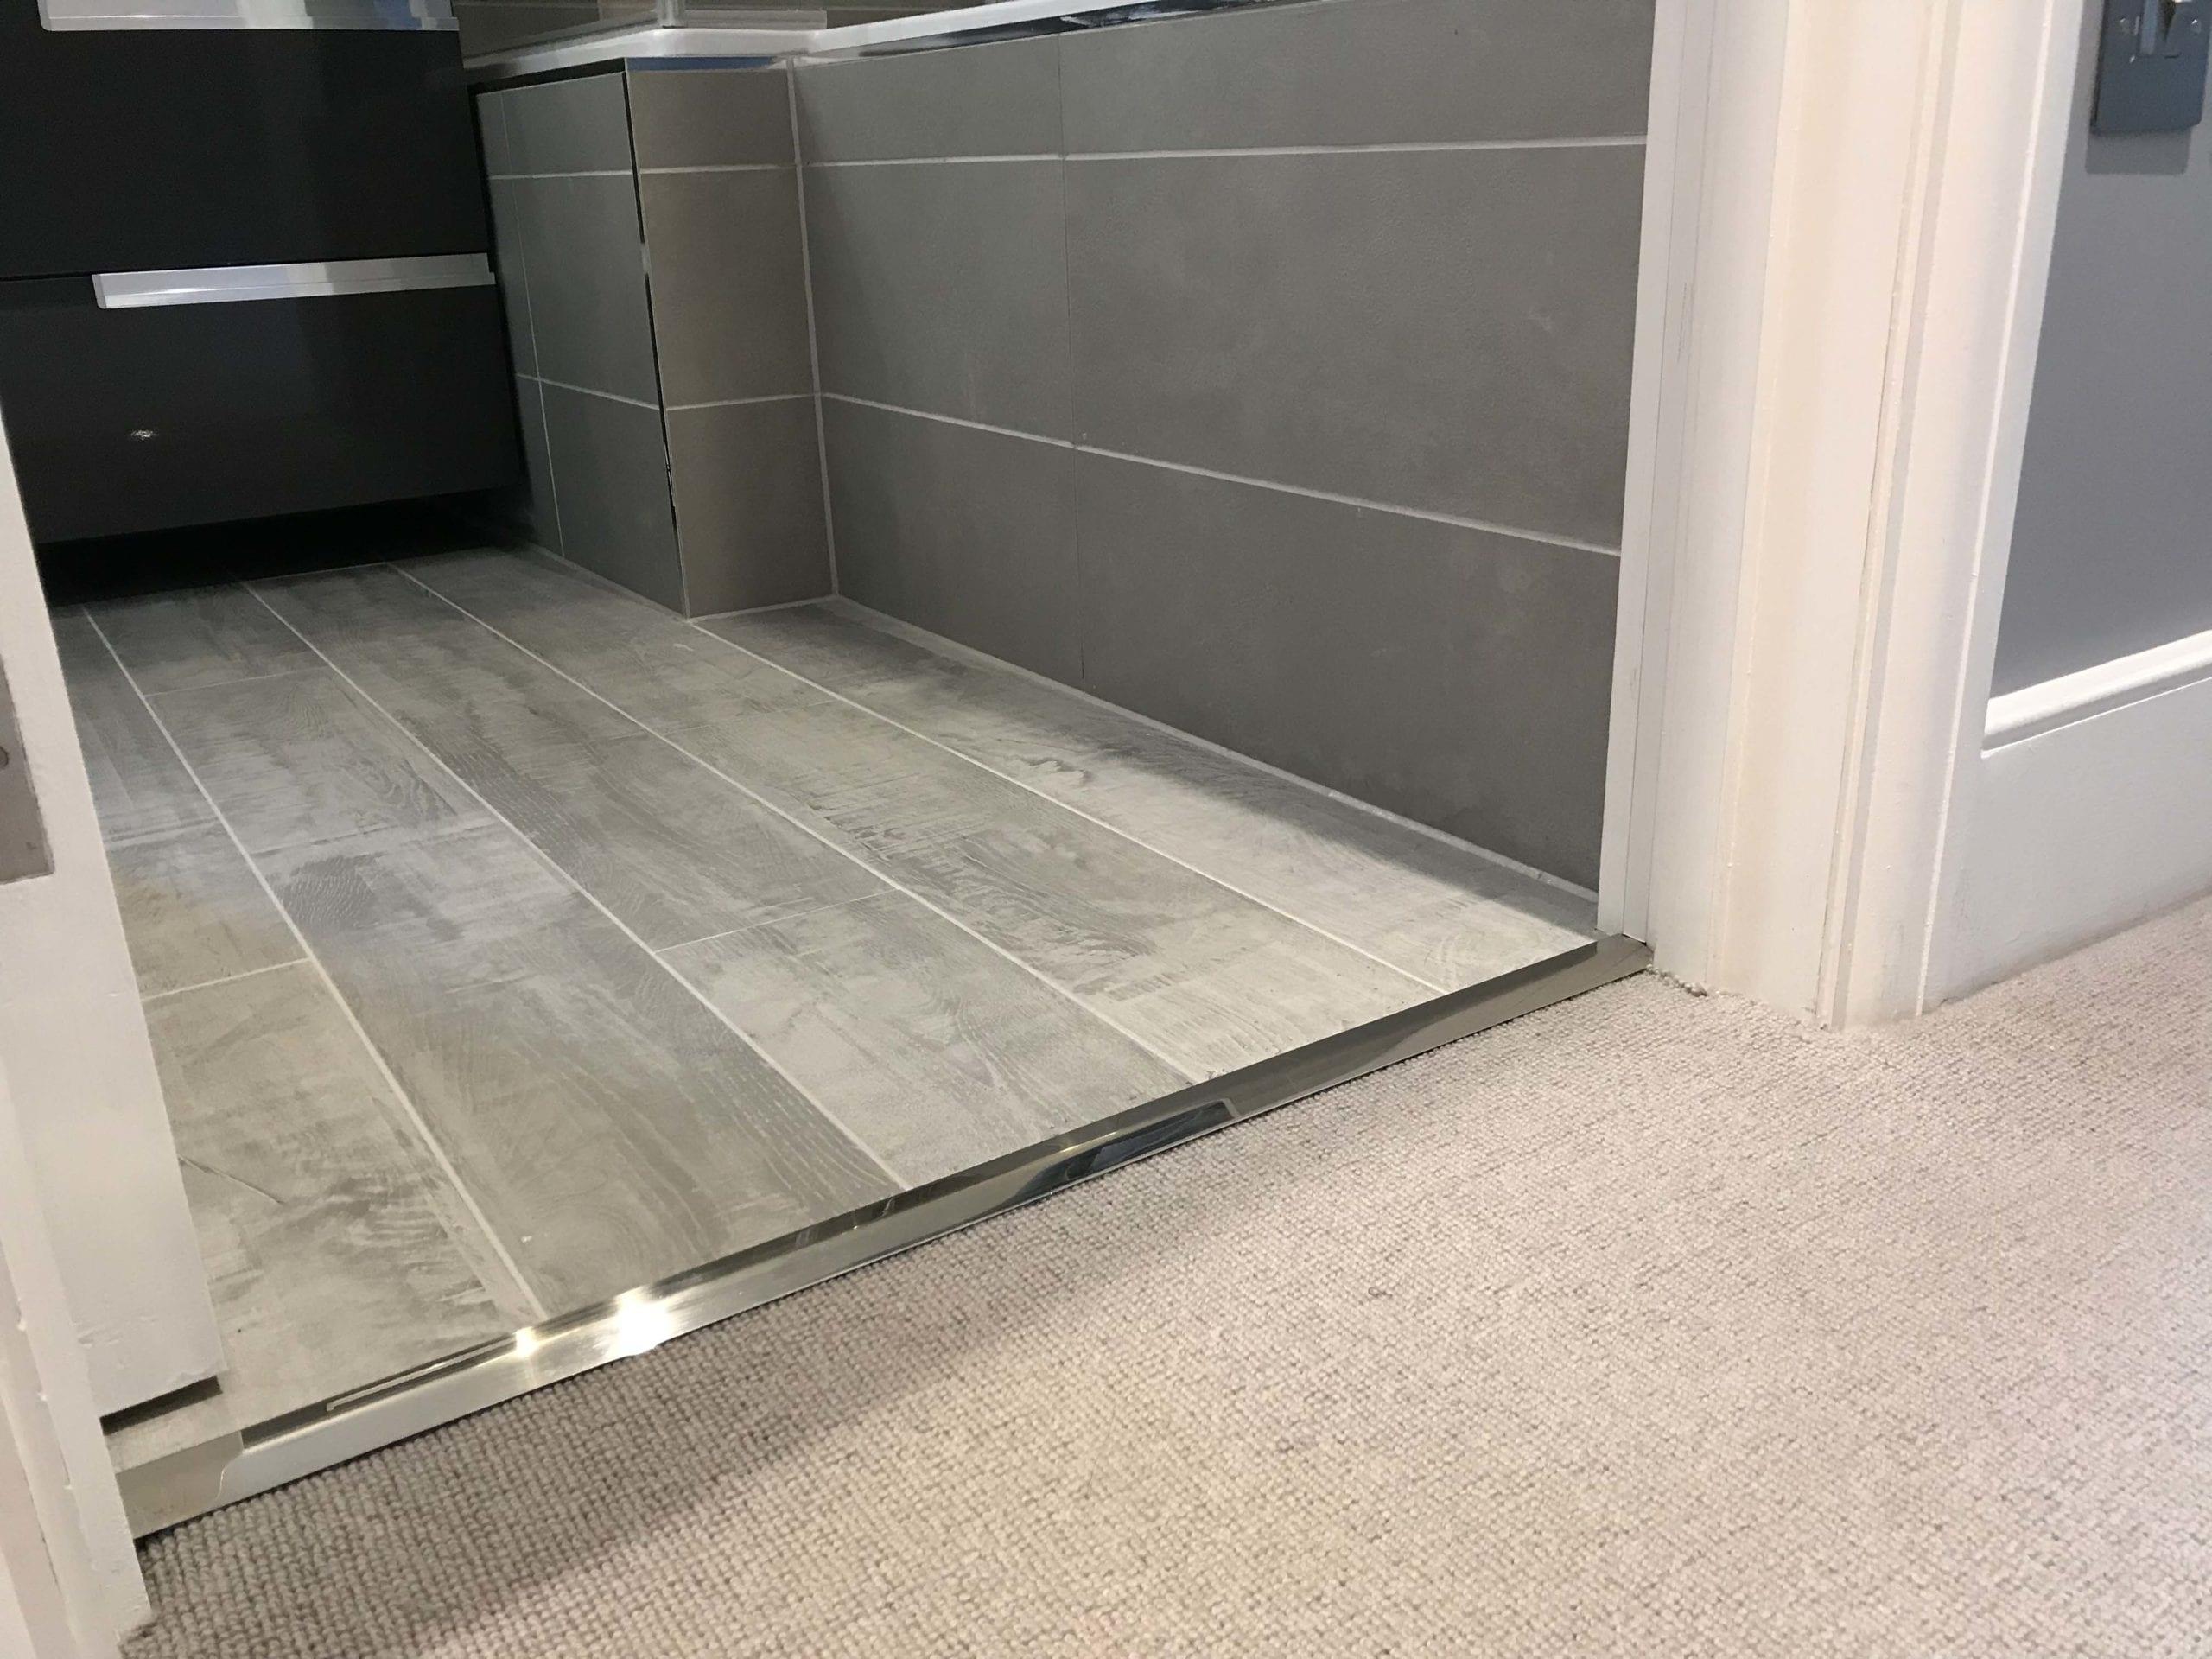 carpet to tile trim fittings door